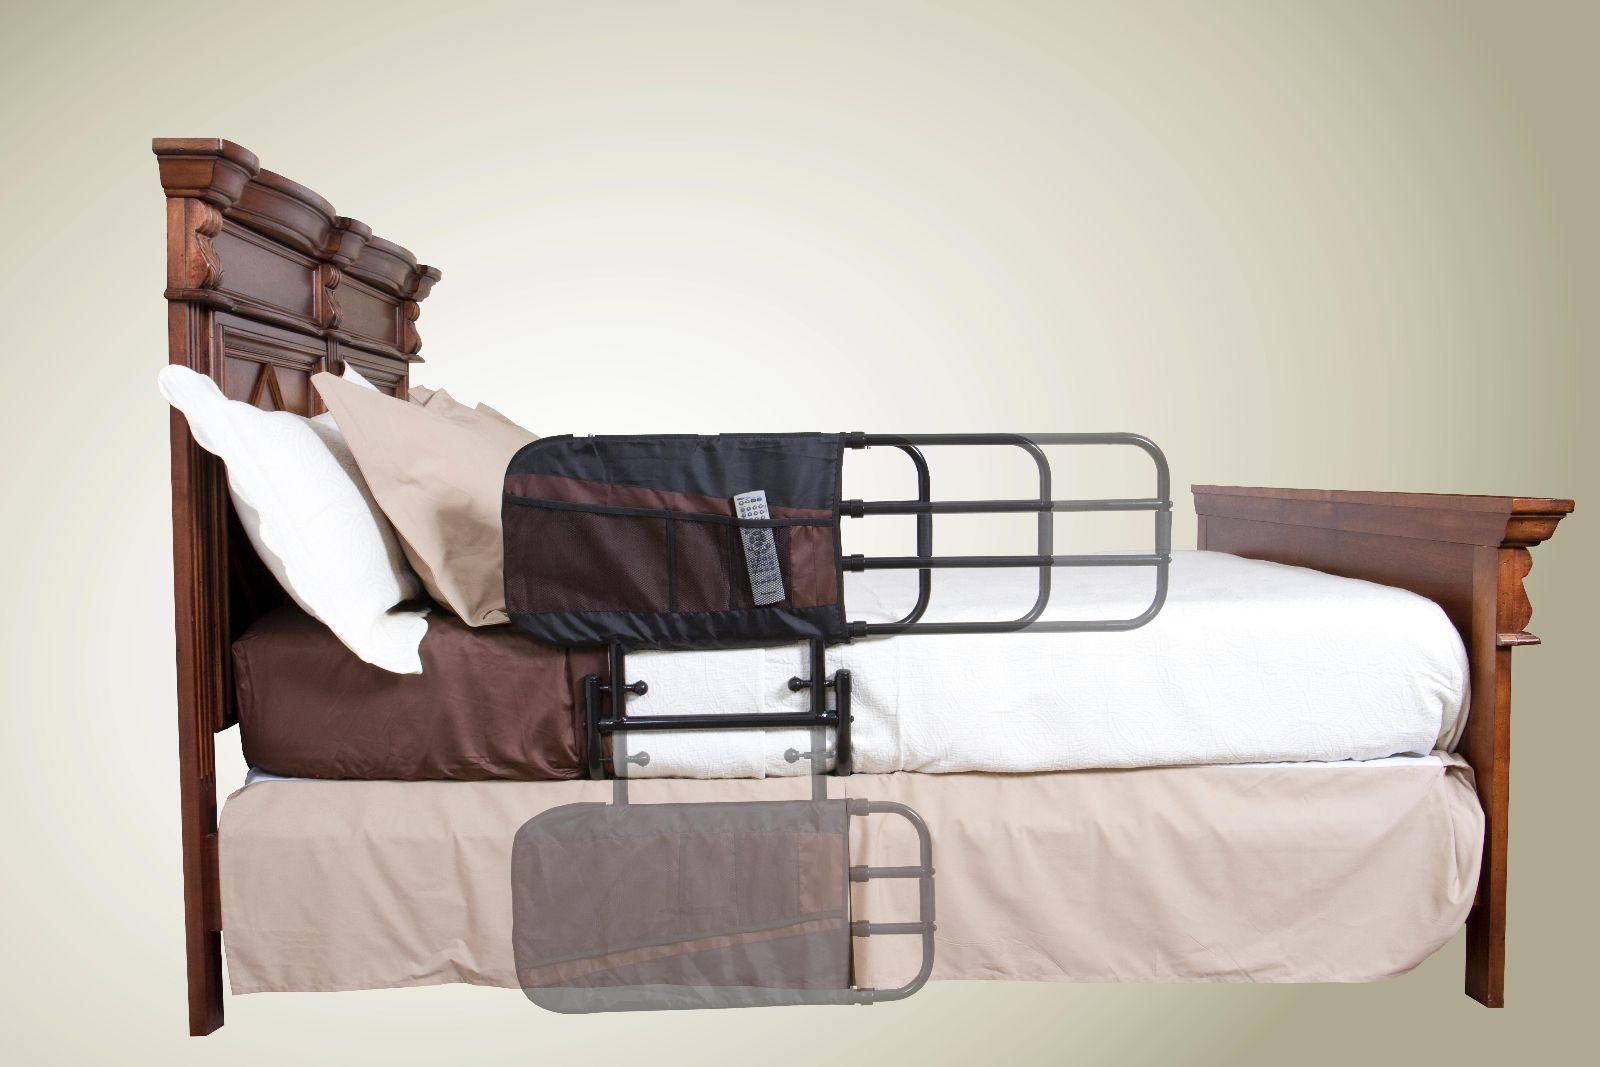 EZ Length Adjustable Bed Assist Rail